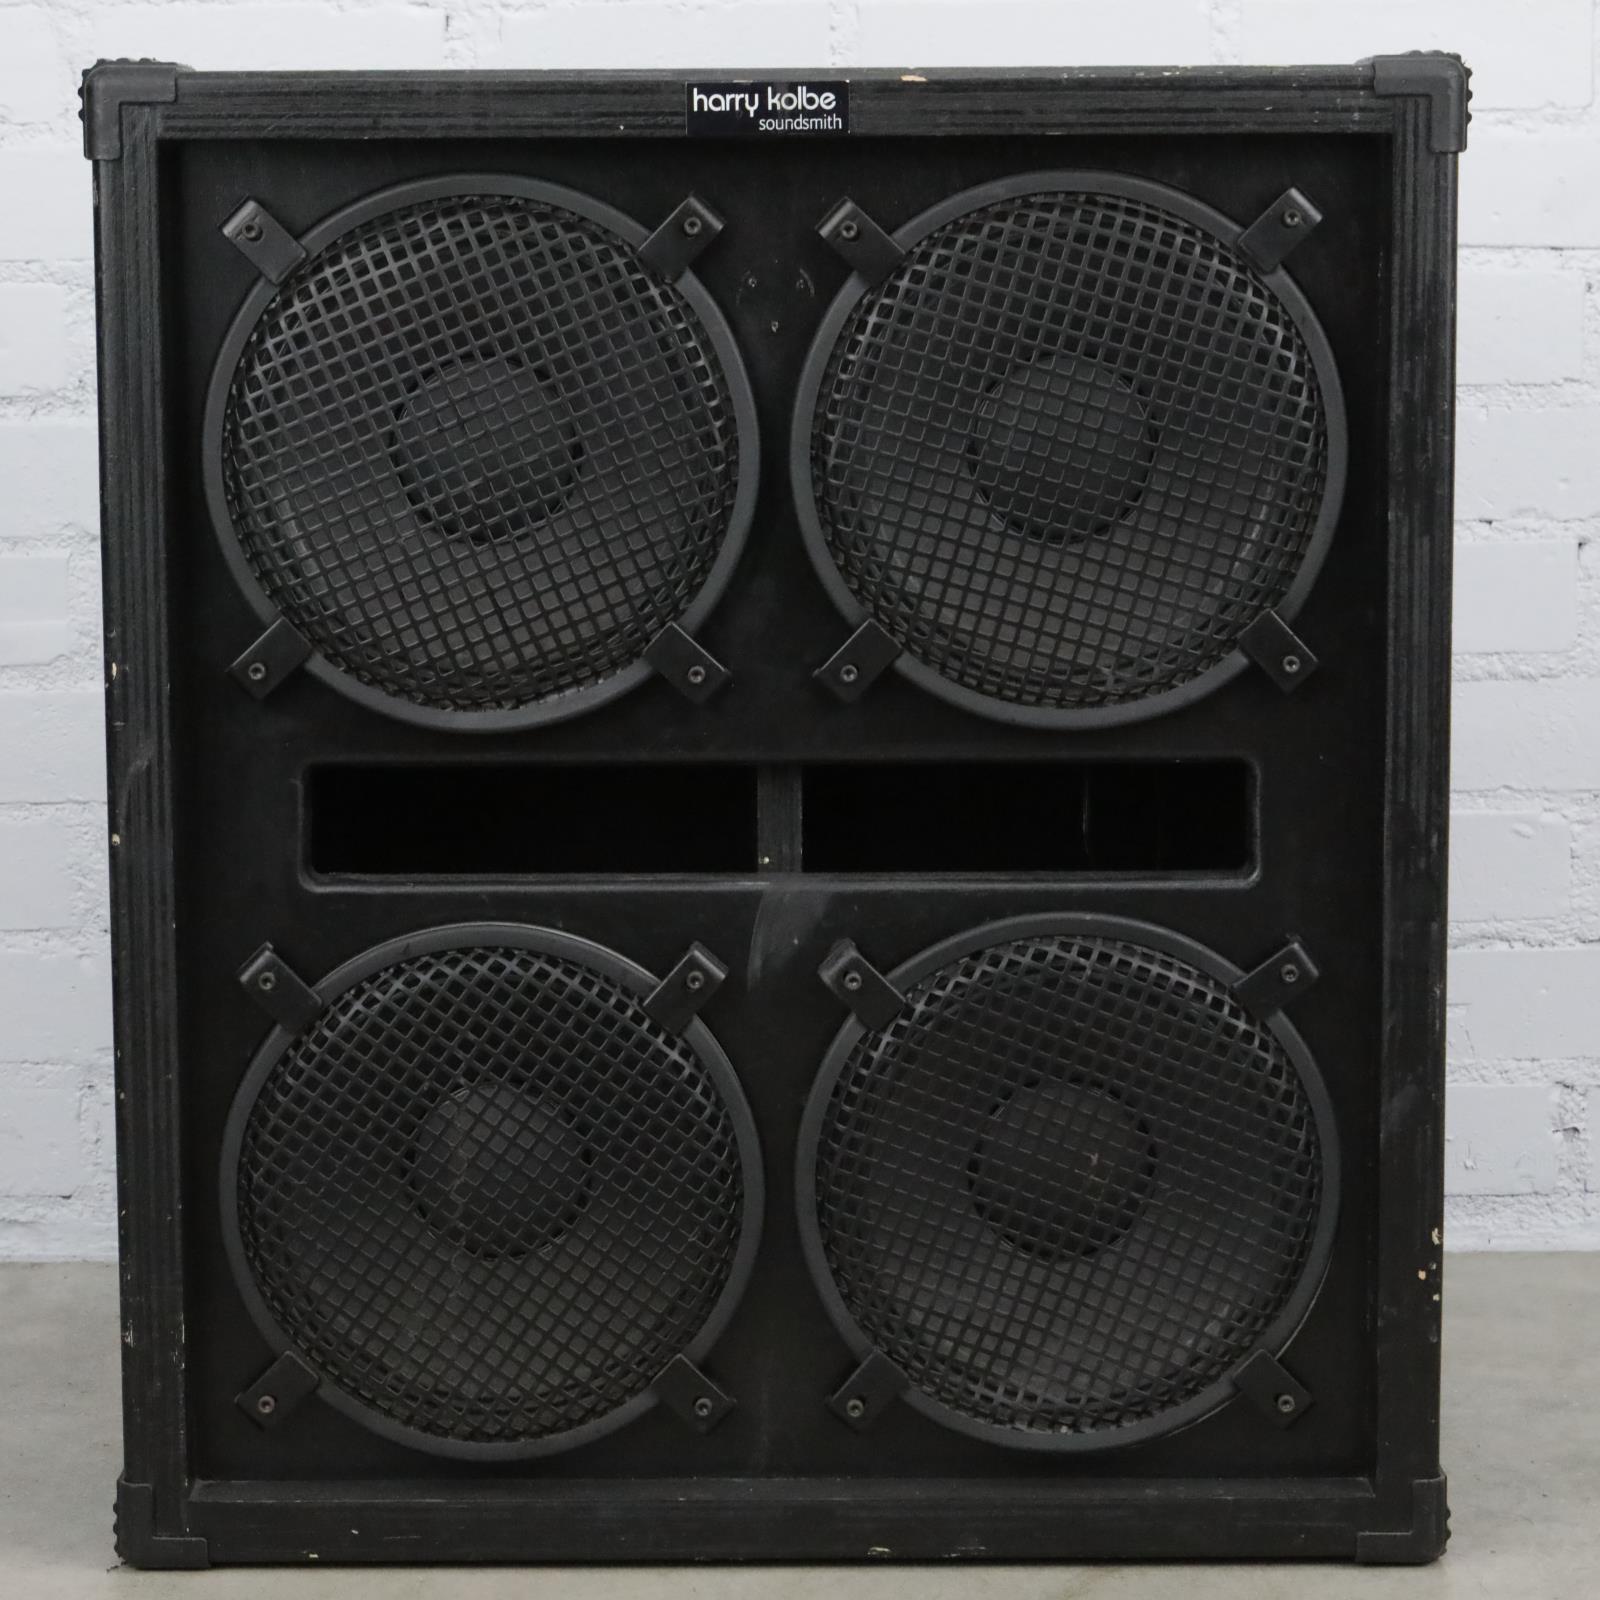 Harry Kolbe Soundsmith DTLA 4x 12 Speaker Cabinet Electro-Voice EVM12L #40493